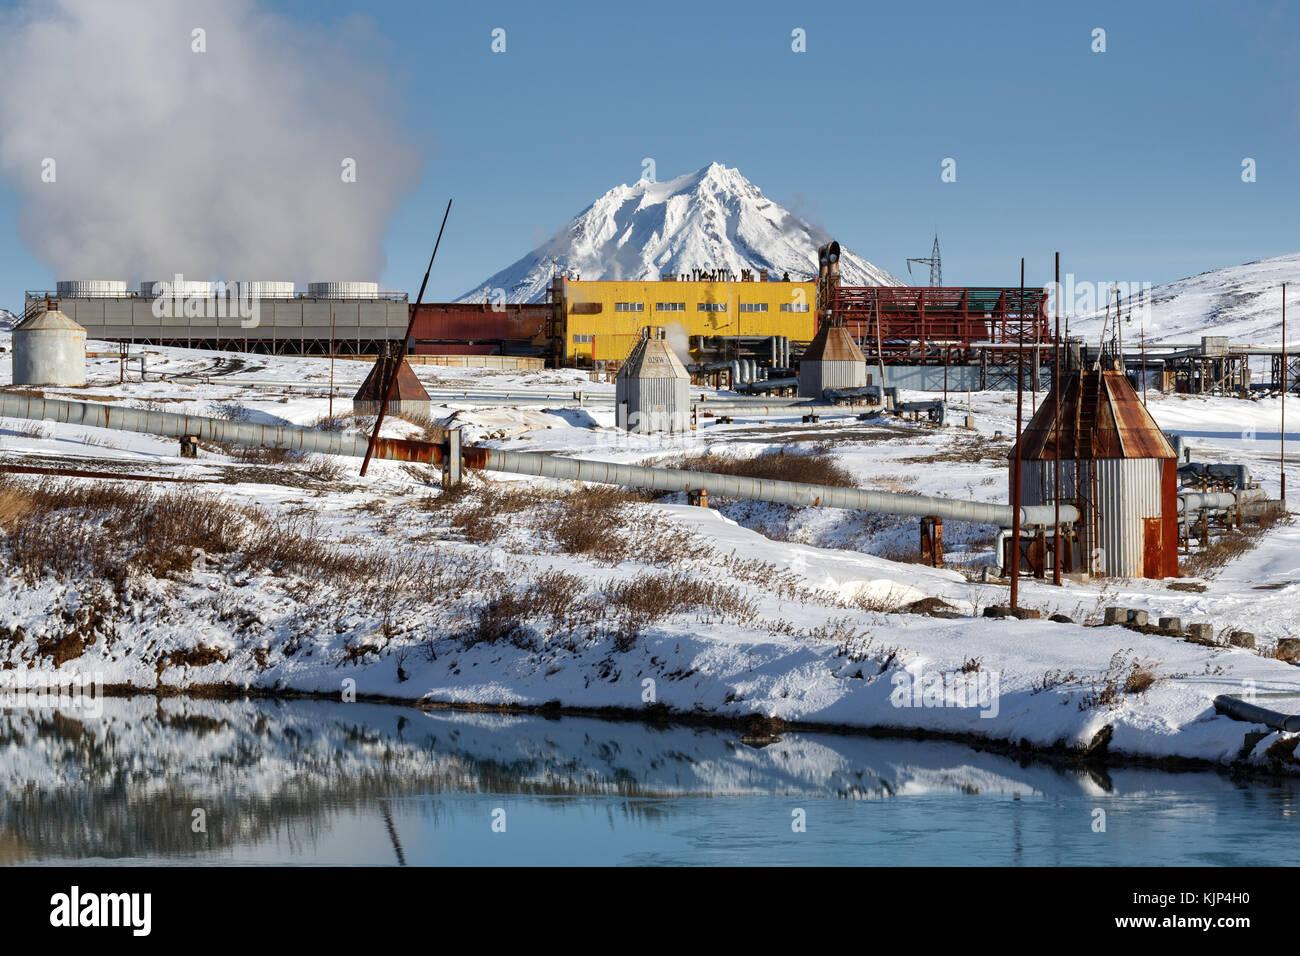 Winter view on Mutnovskaya Geothermal Power Station (Mutnovskaya GeoPP-1) Geotherm (RusHydro) using geothermal energy - Stock Image